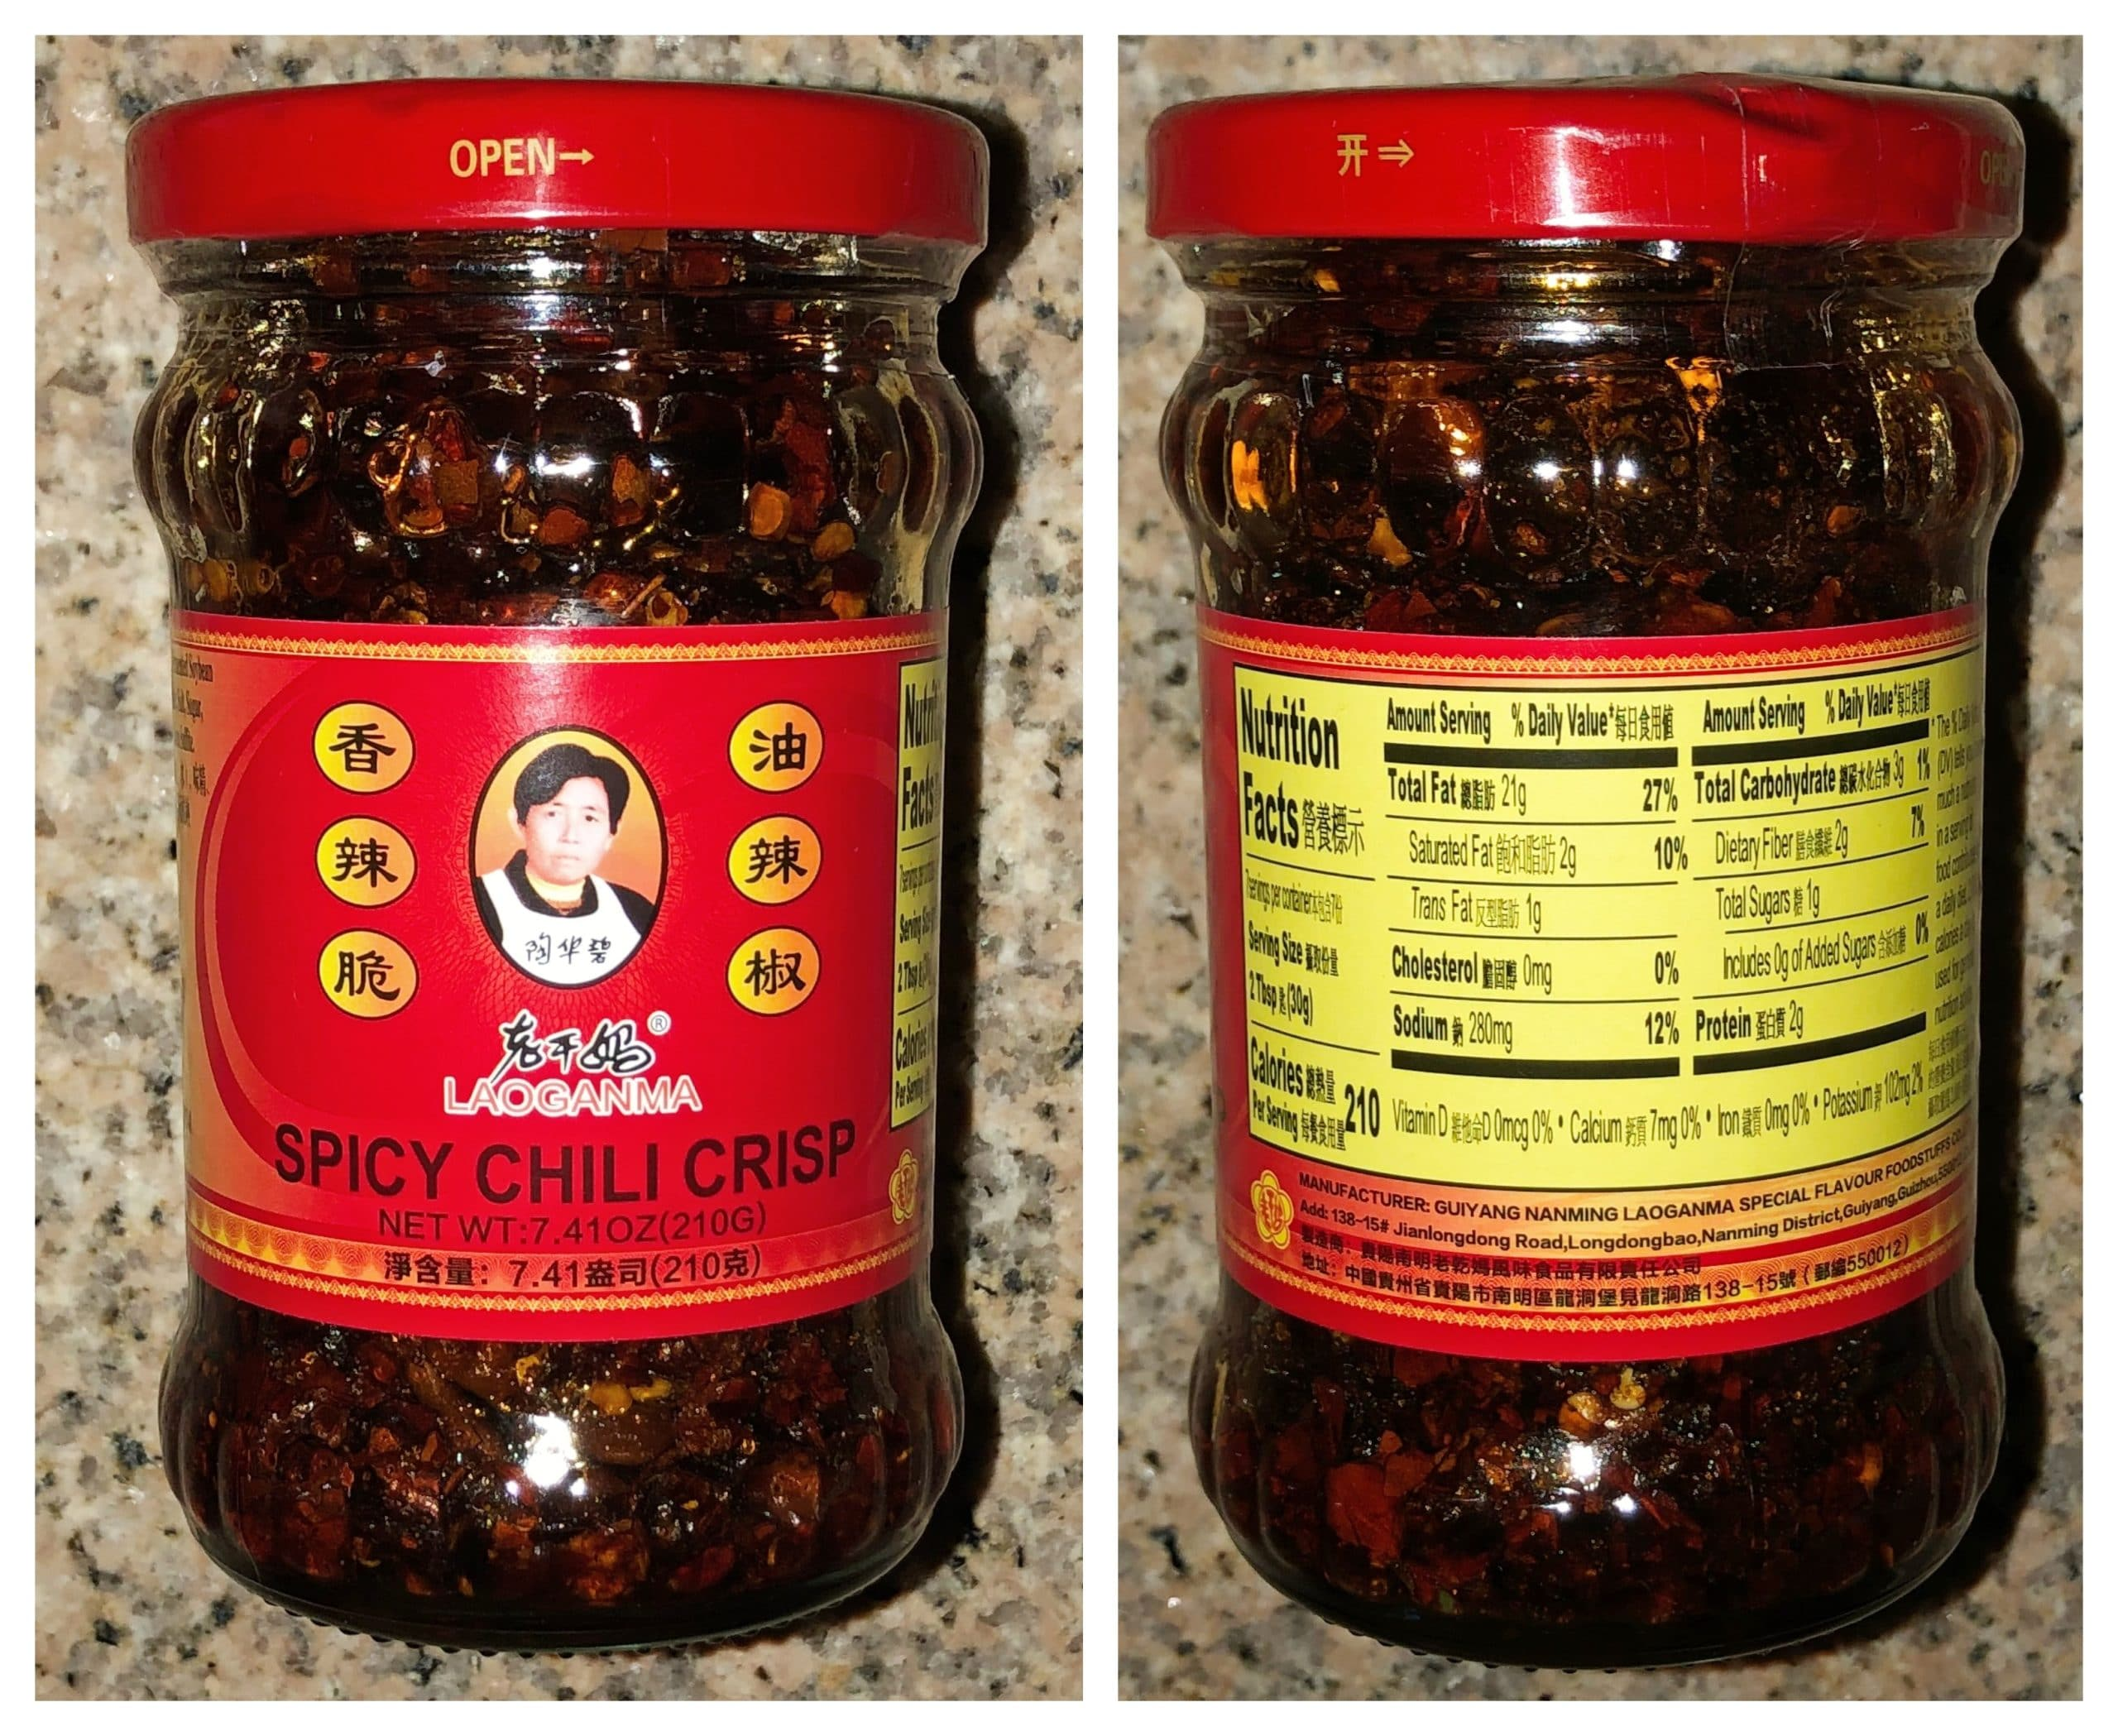 Bespoke Post Spicy Chili Crisp